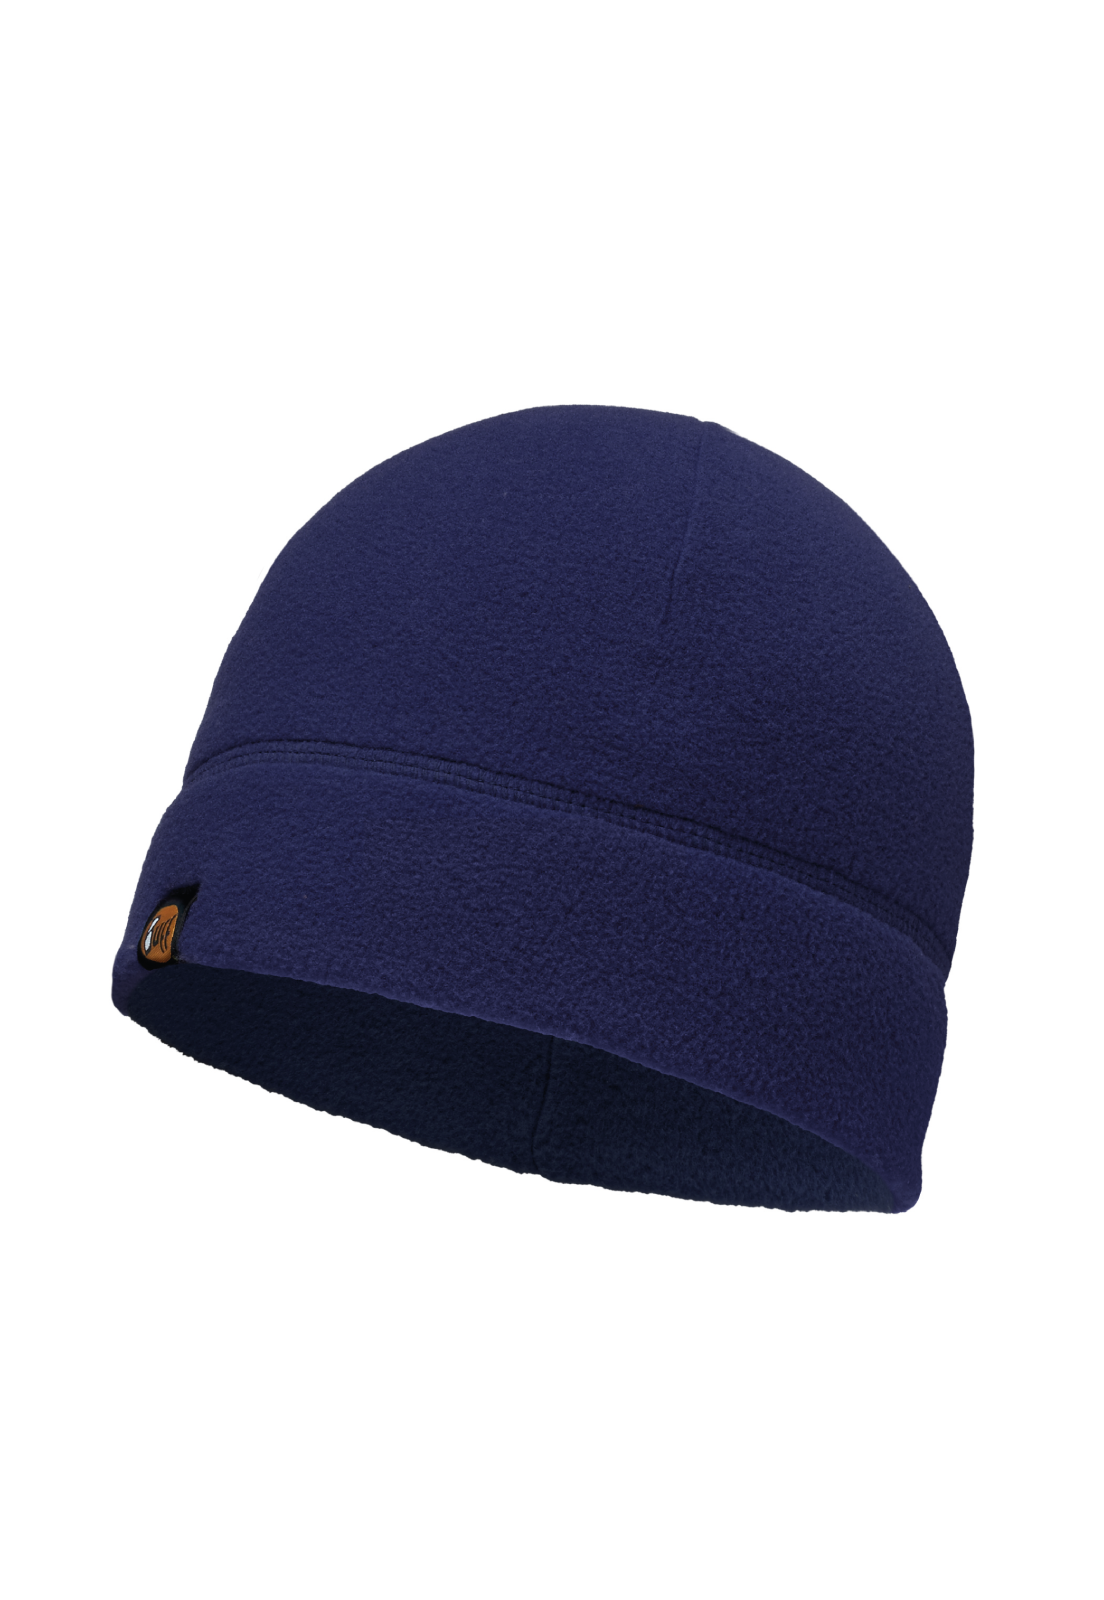 Polar Hat Solid Navy